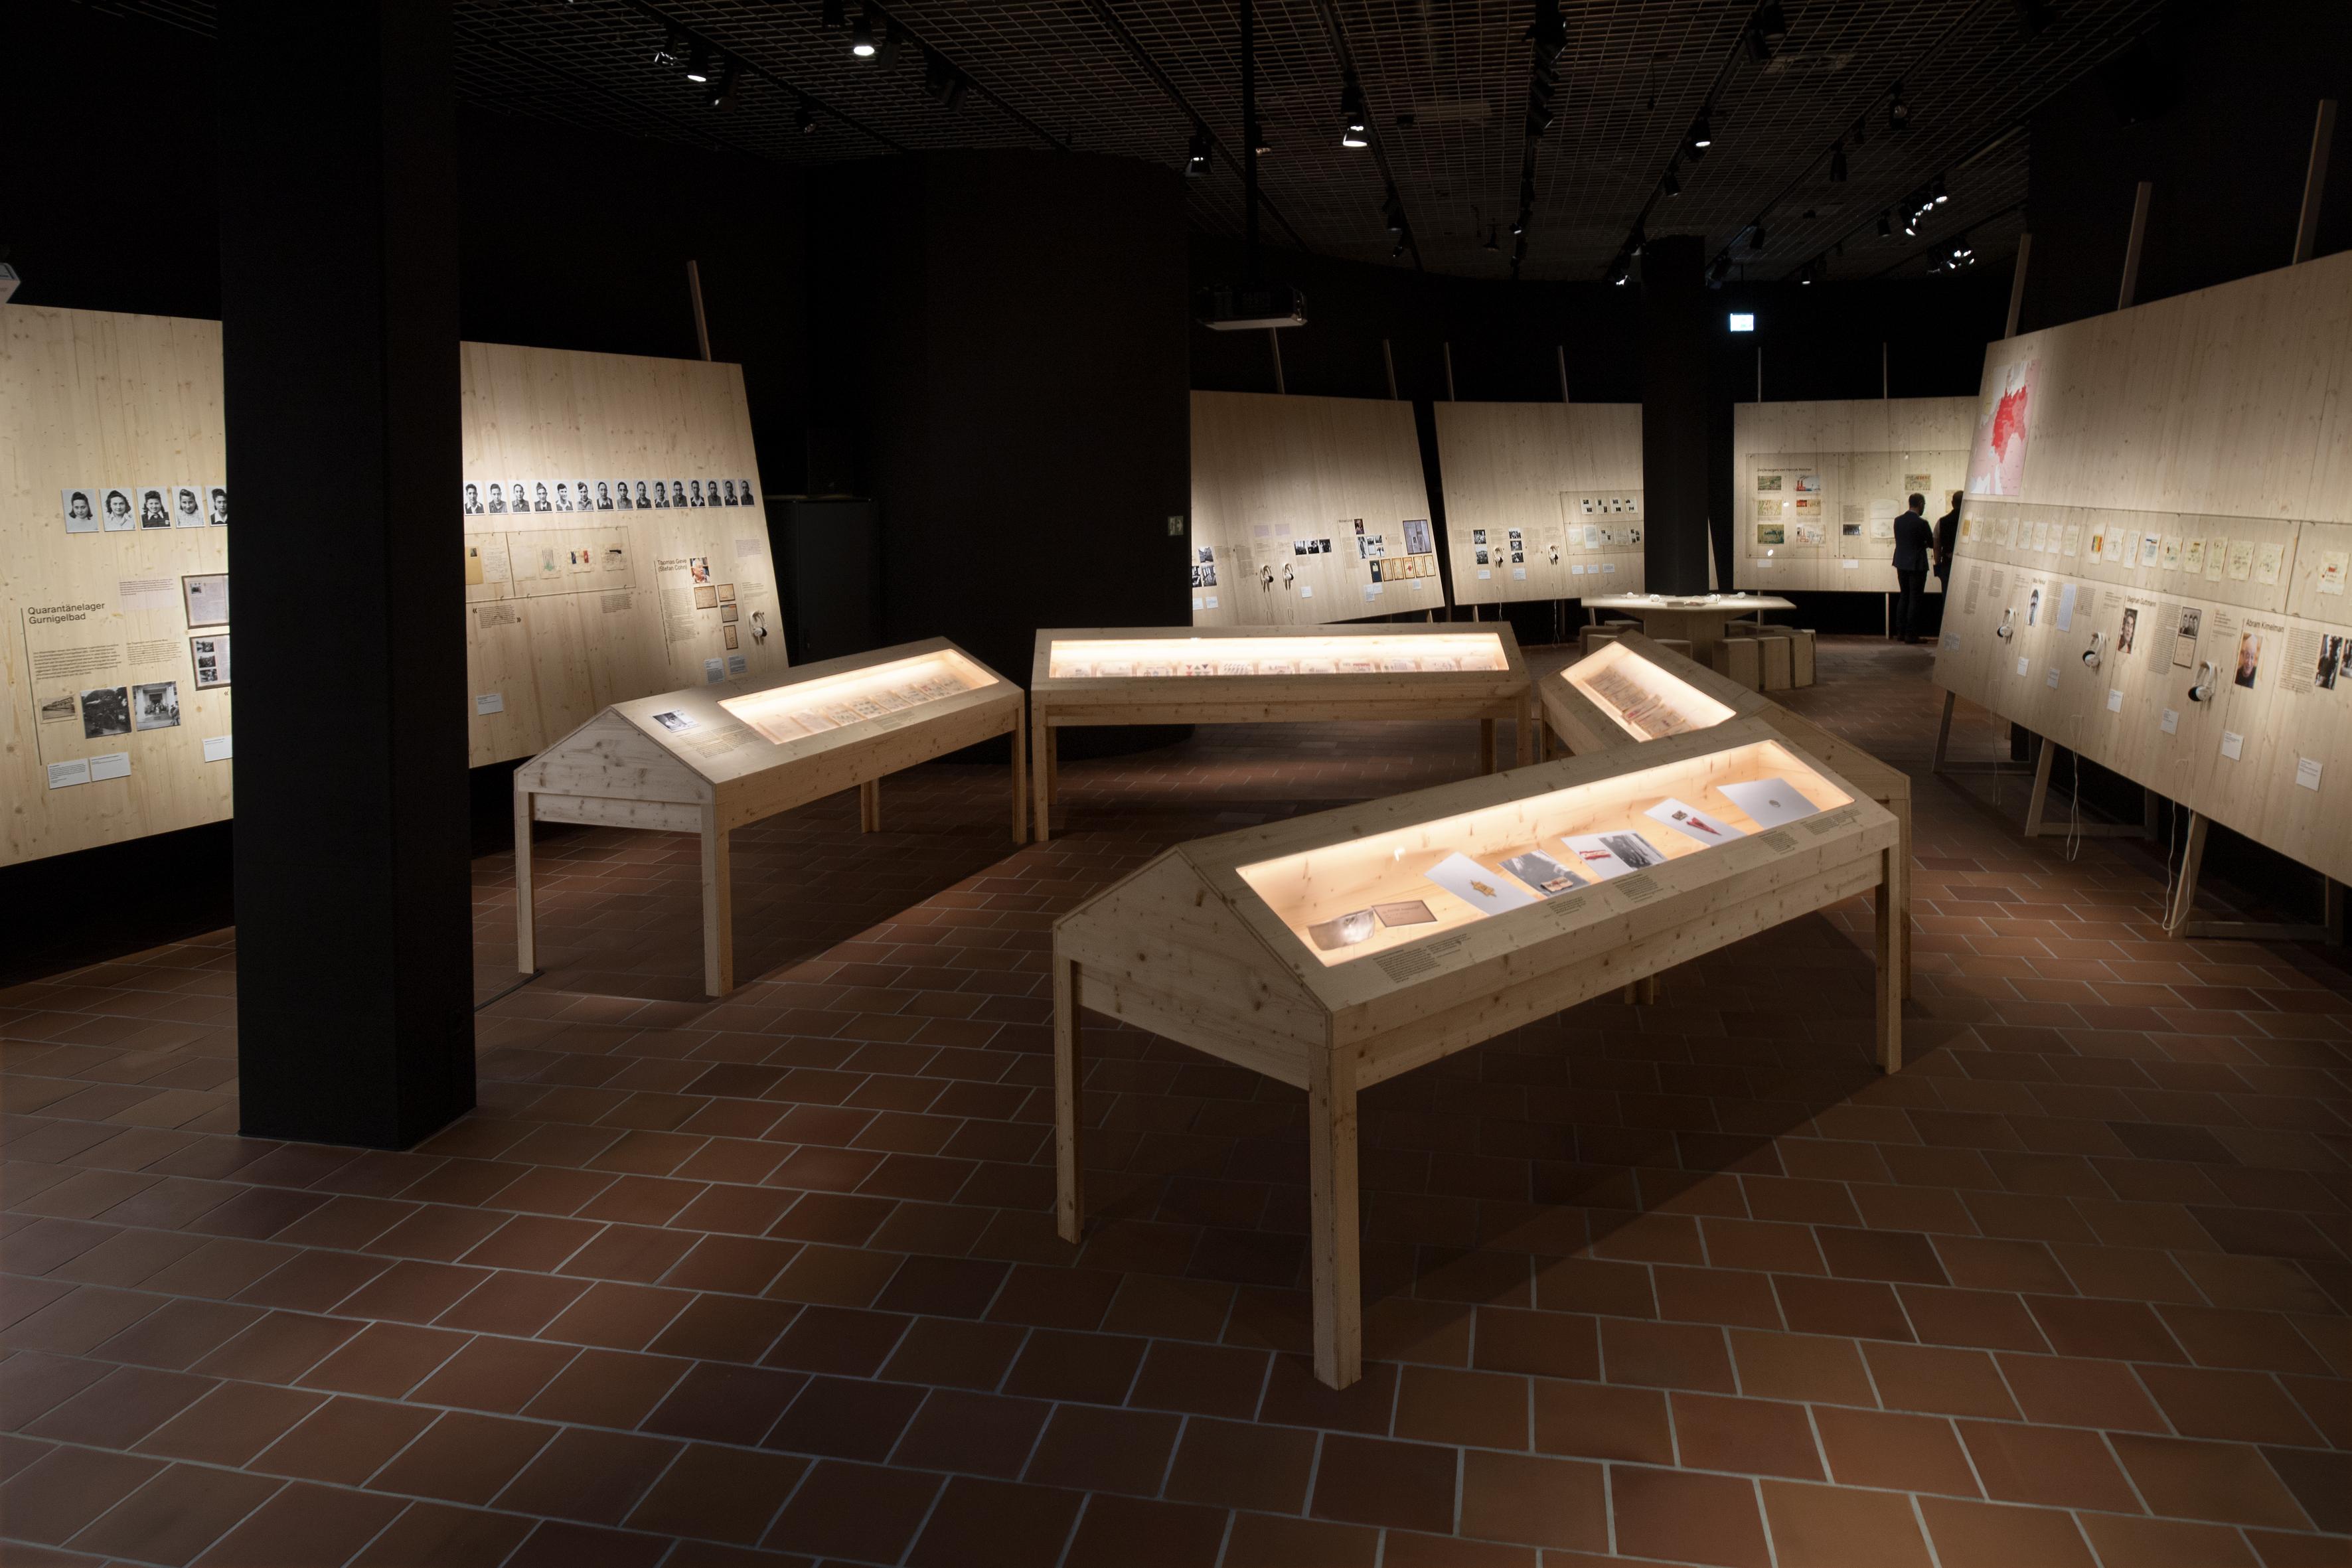 Blick in die Ausstellung. Foto: Regula Bearth, ZHdK